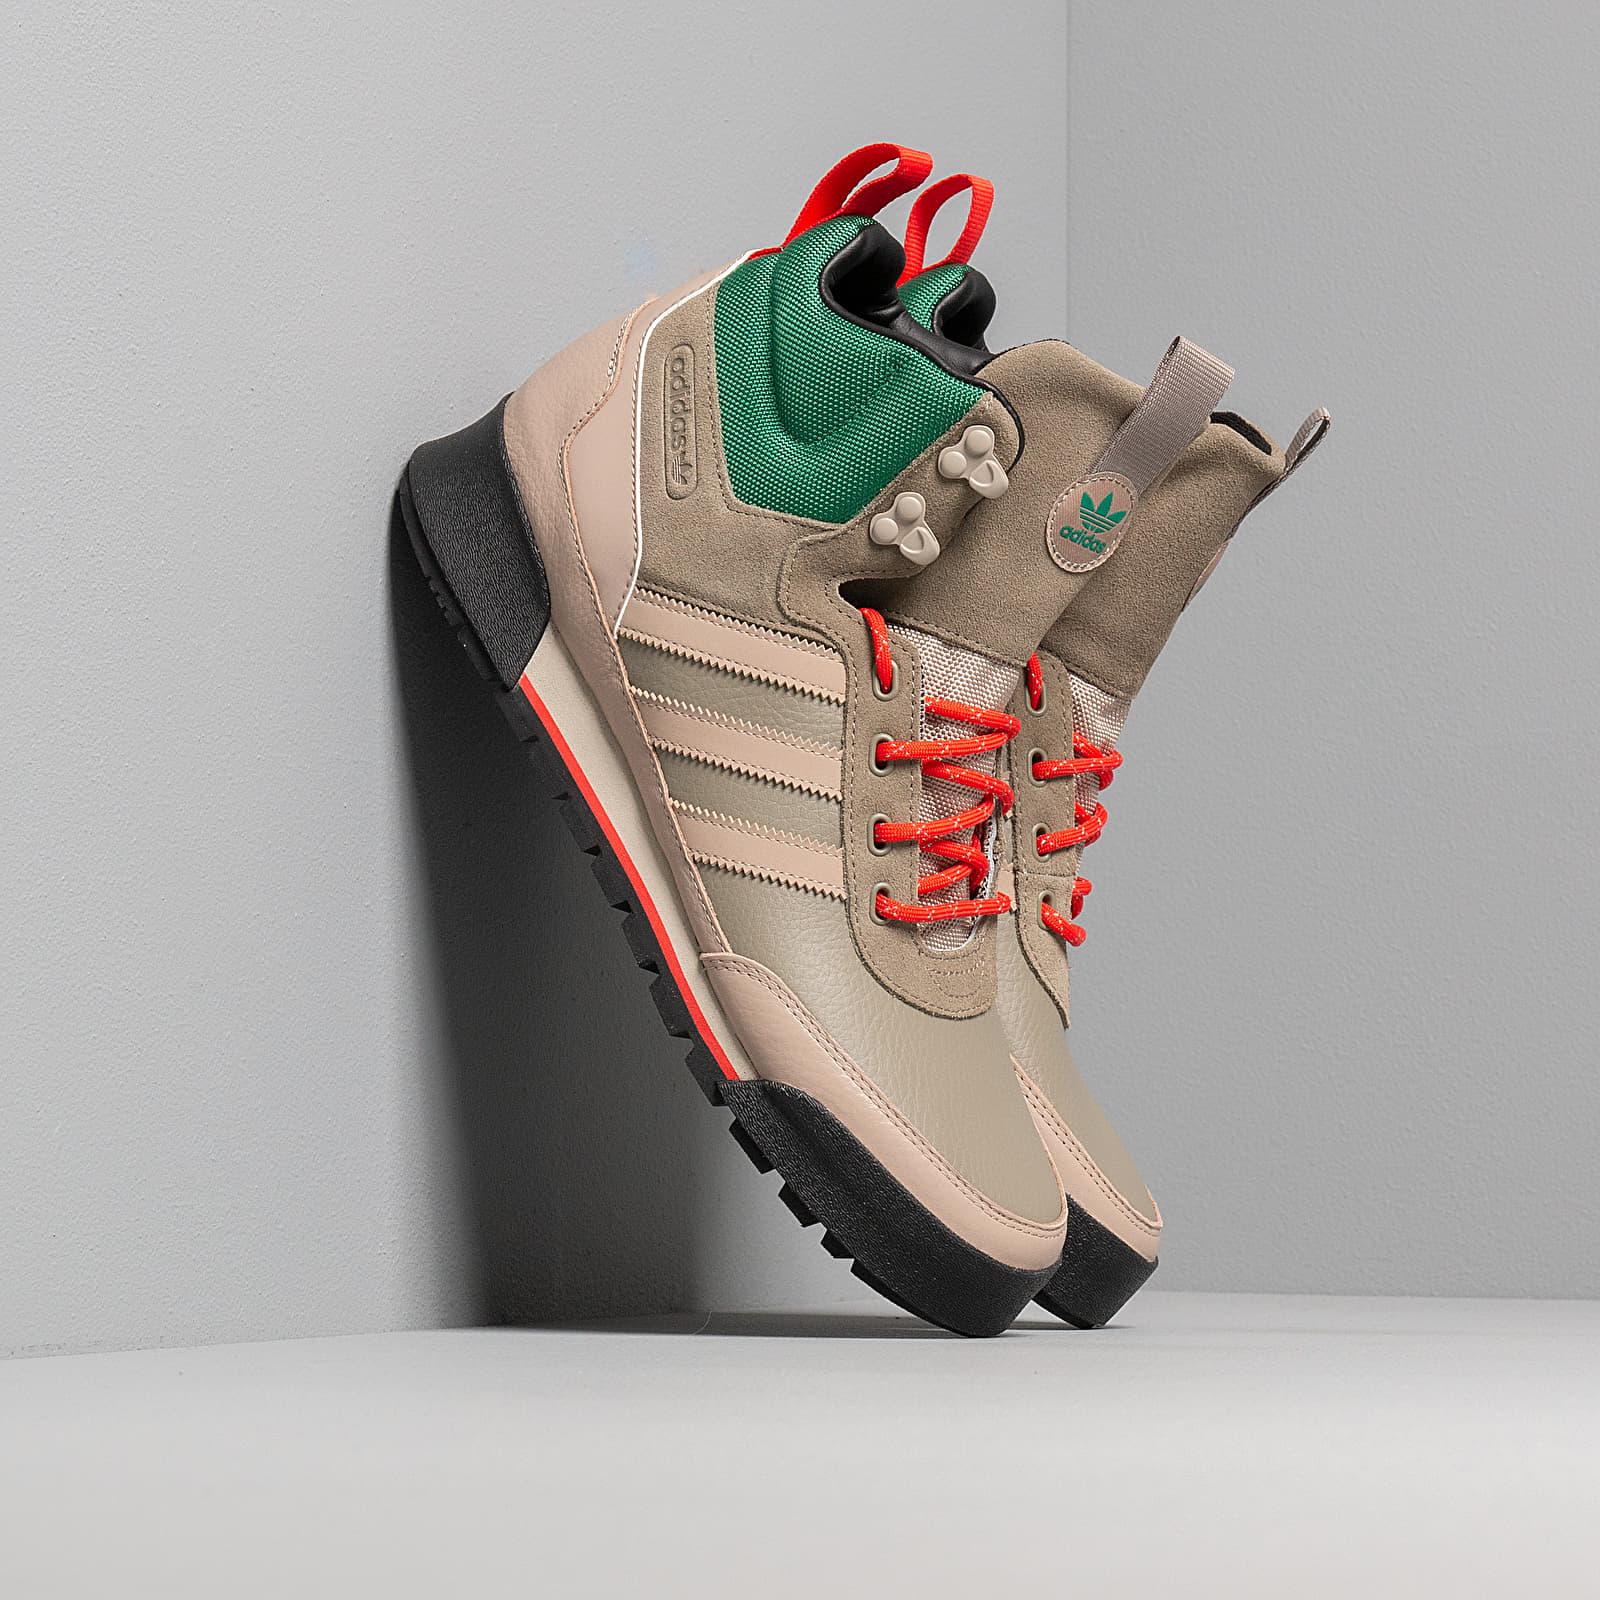 Férfi cipők adidas Baara Boot Trace Khaki/ Trace Cargo/ Core Black